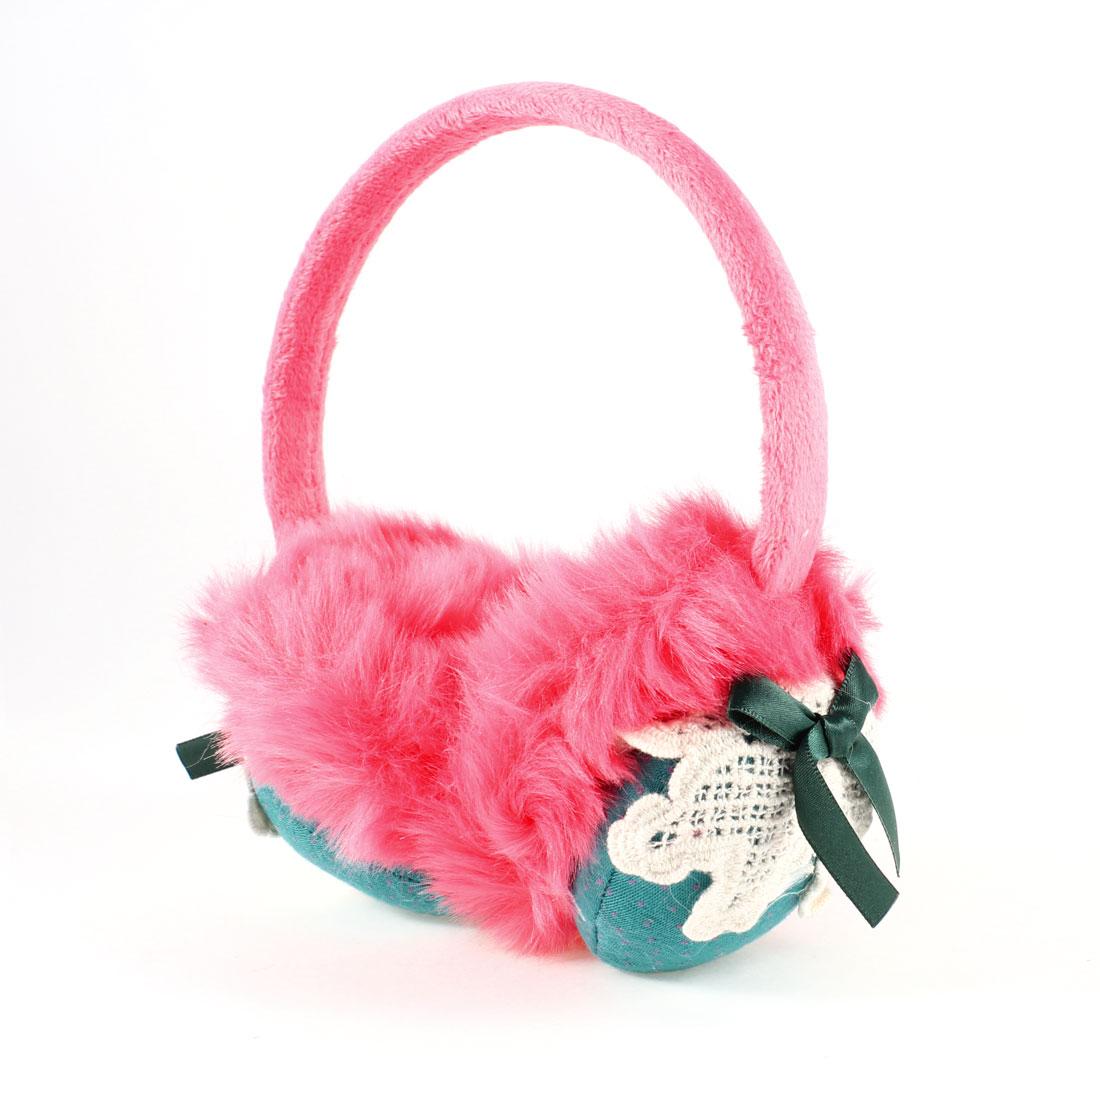 Ladies Fluffy Earpad Round Headband Winter Ear Cover Earmuff Hot Pink